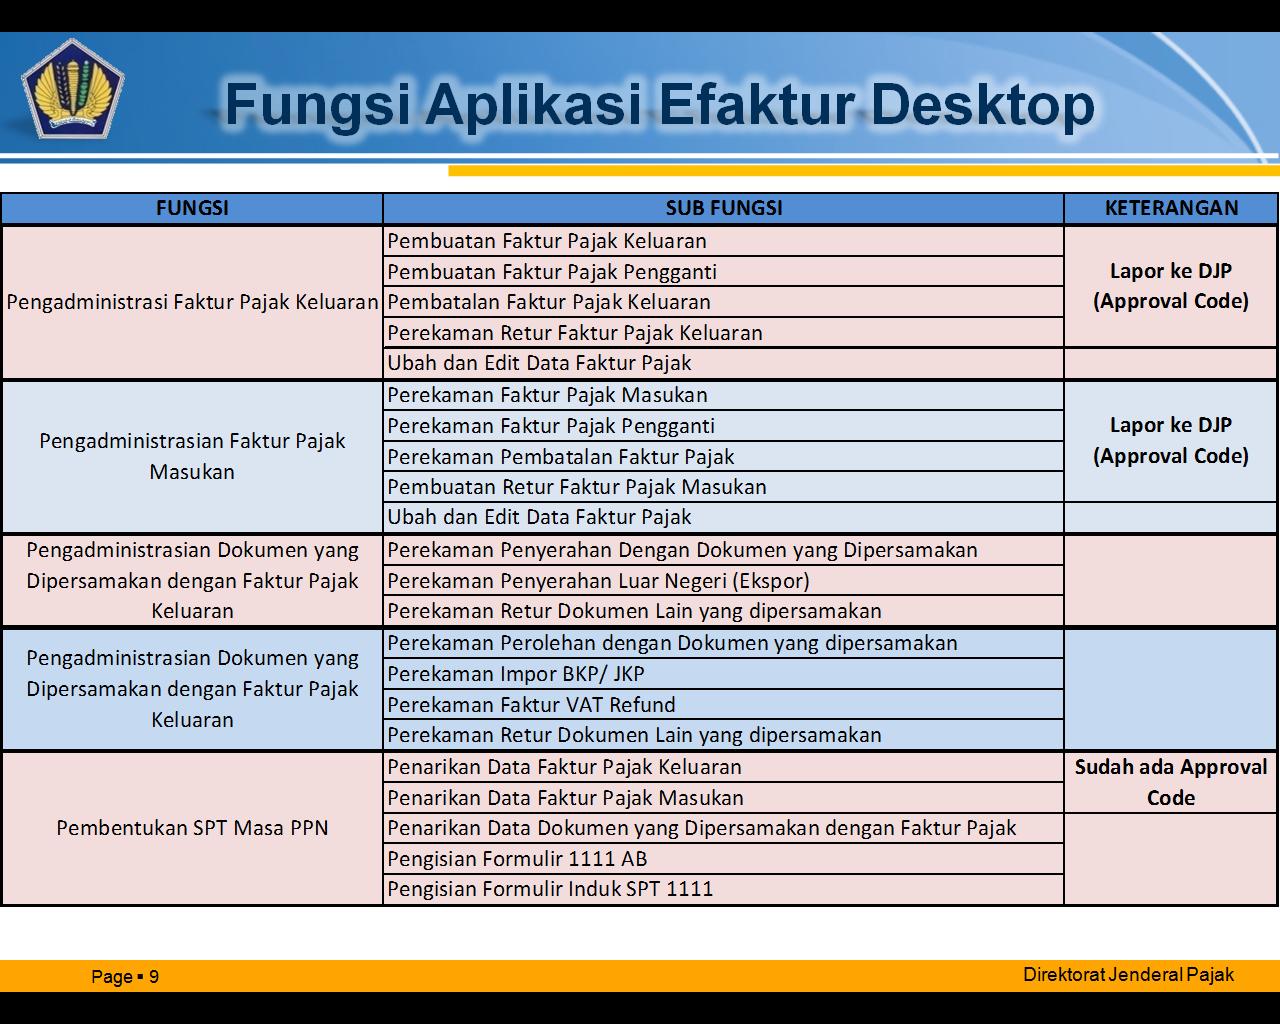 Daftar Fungsi Aplikasi e-faktur Desktop